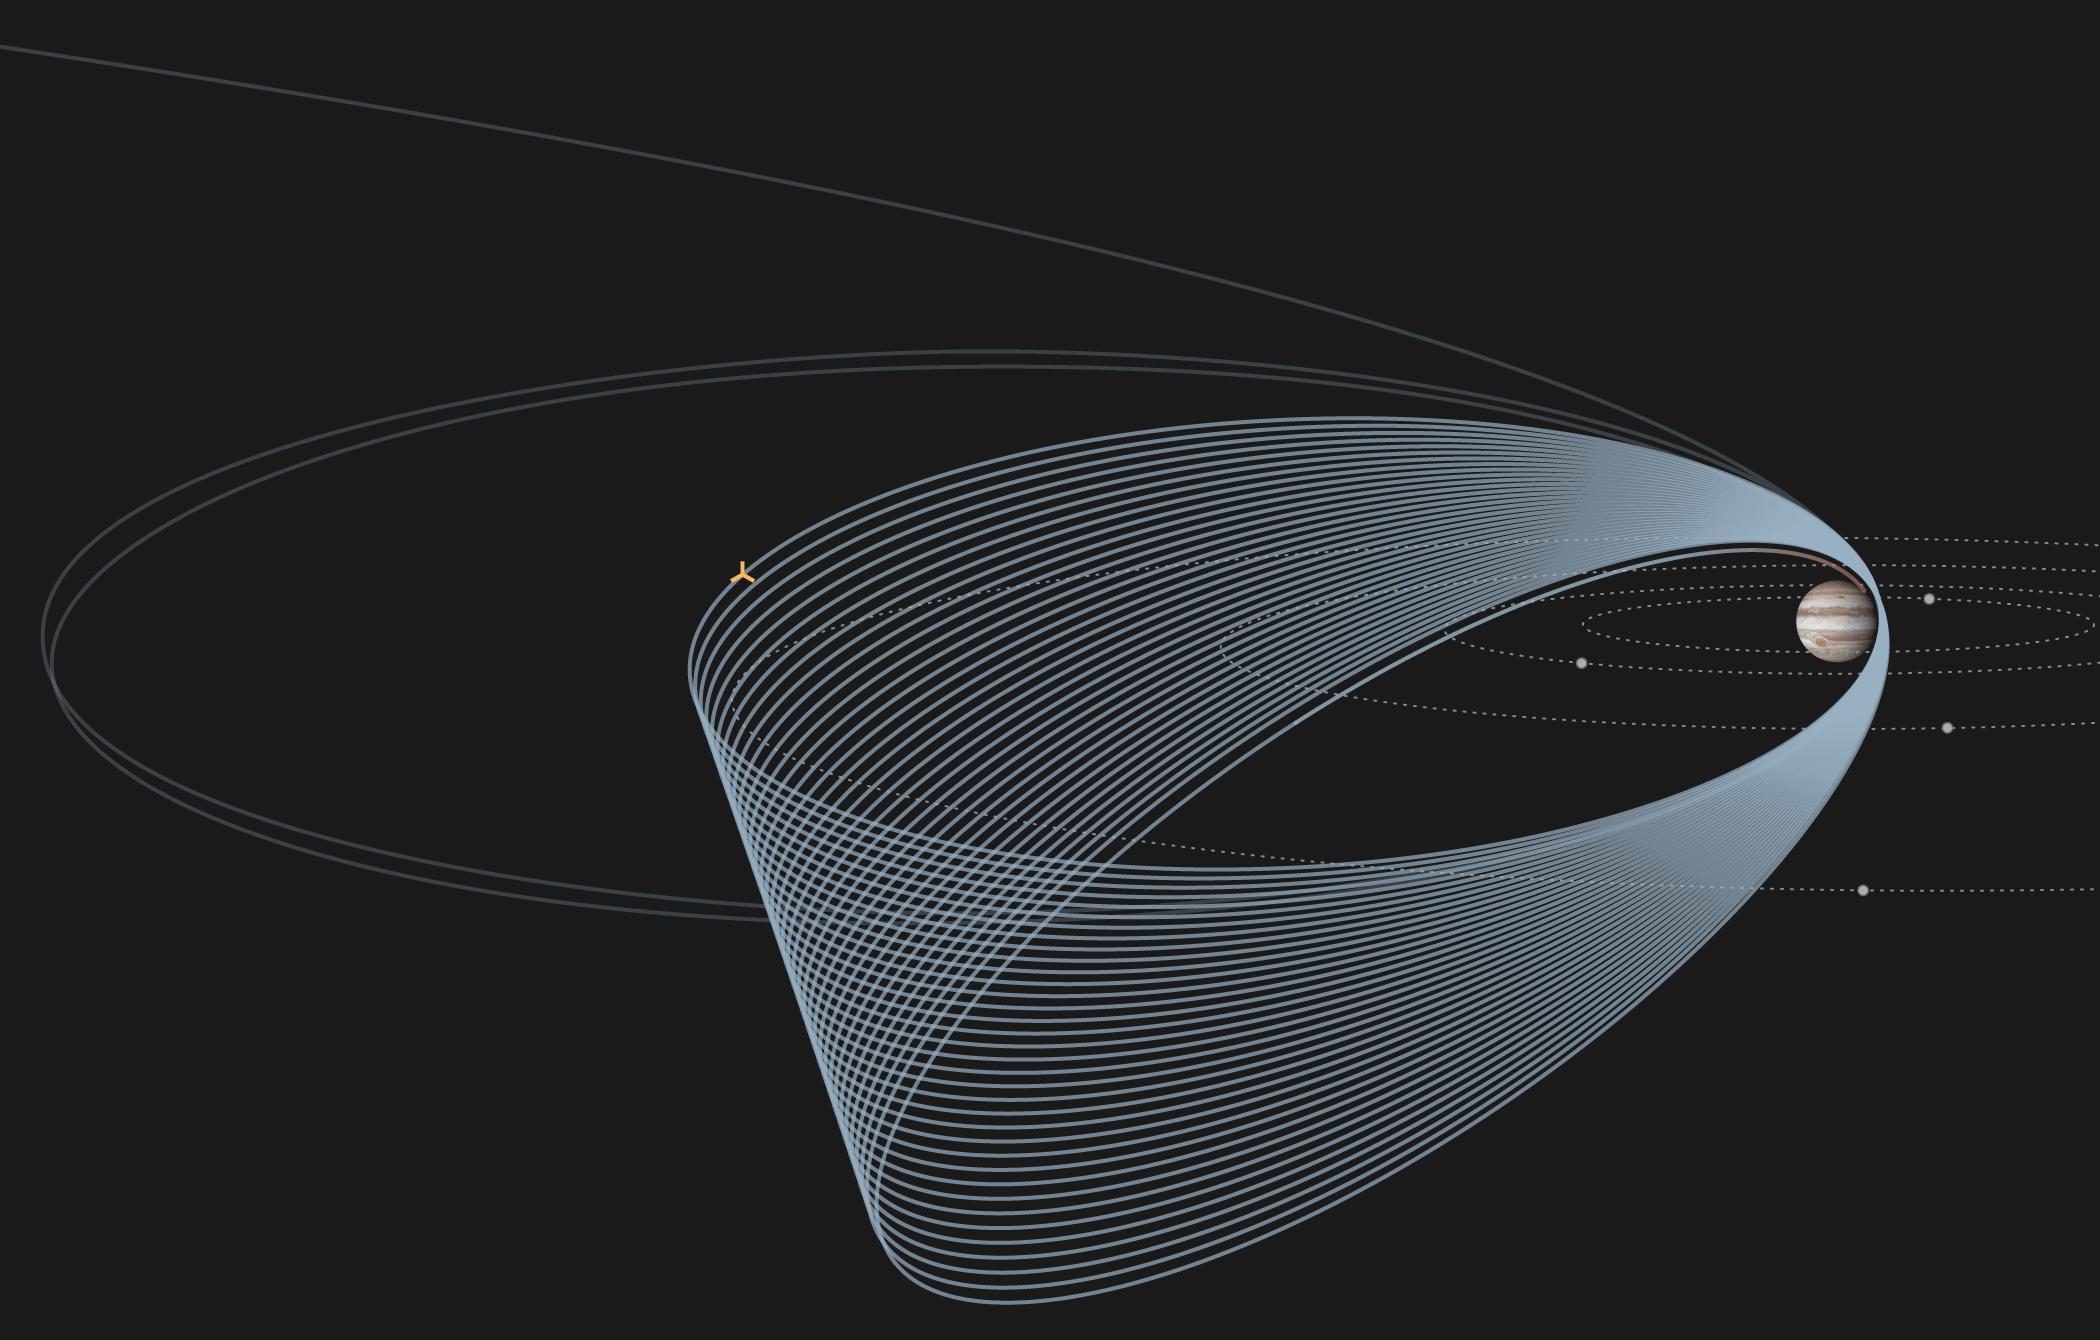 Juno's orbit around Jupiter.